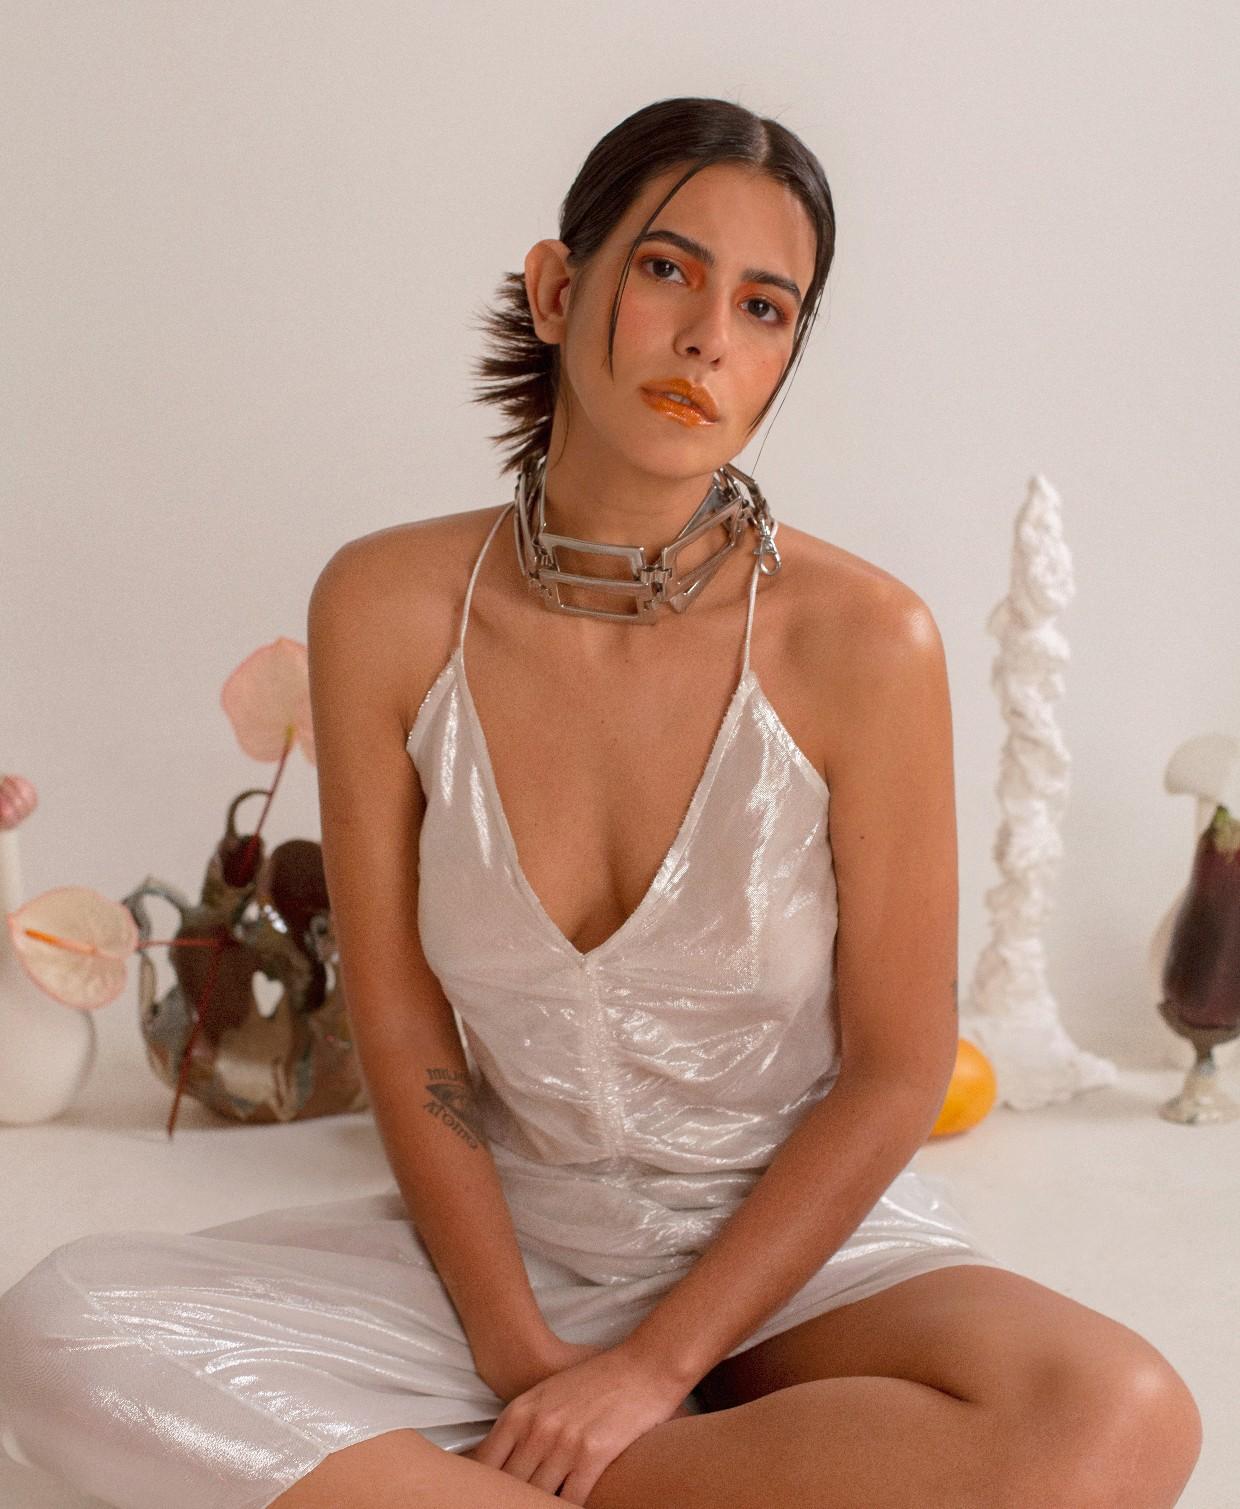 Antonia Morais transita entre trip hop e indie pop no segundo álbum